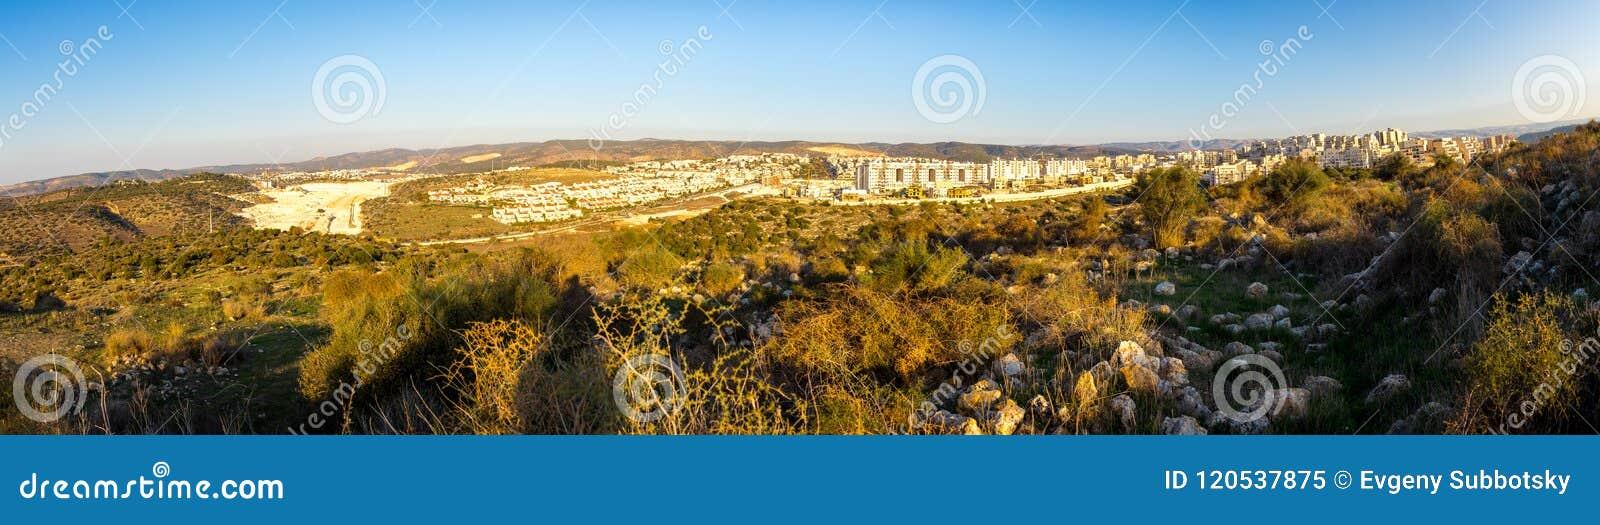 Maximillian Shemesh: Beit Shemesh City Buildings Panorama. Stock Image